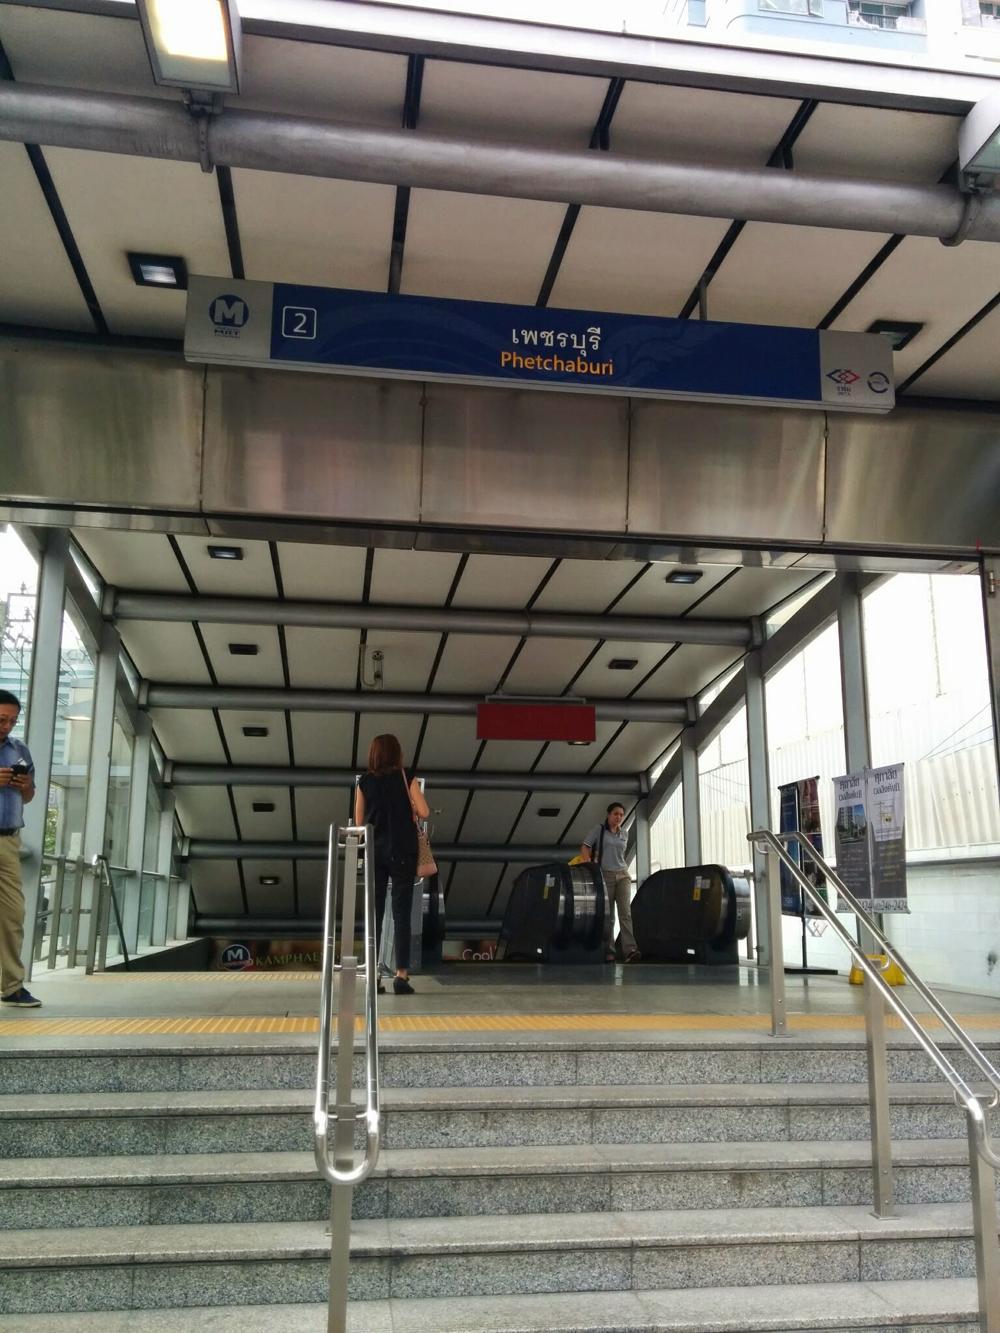 """MRTのPhetchaburi駅の2番口を出て</p"